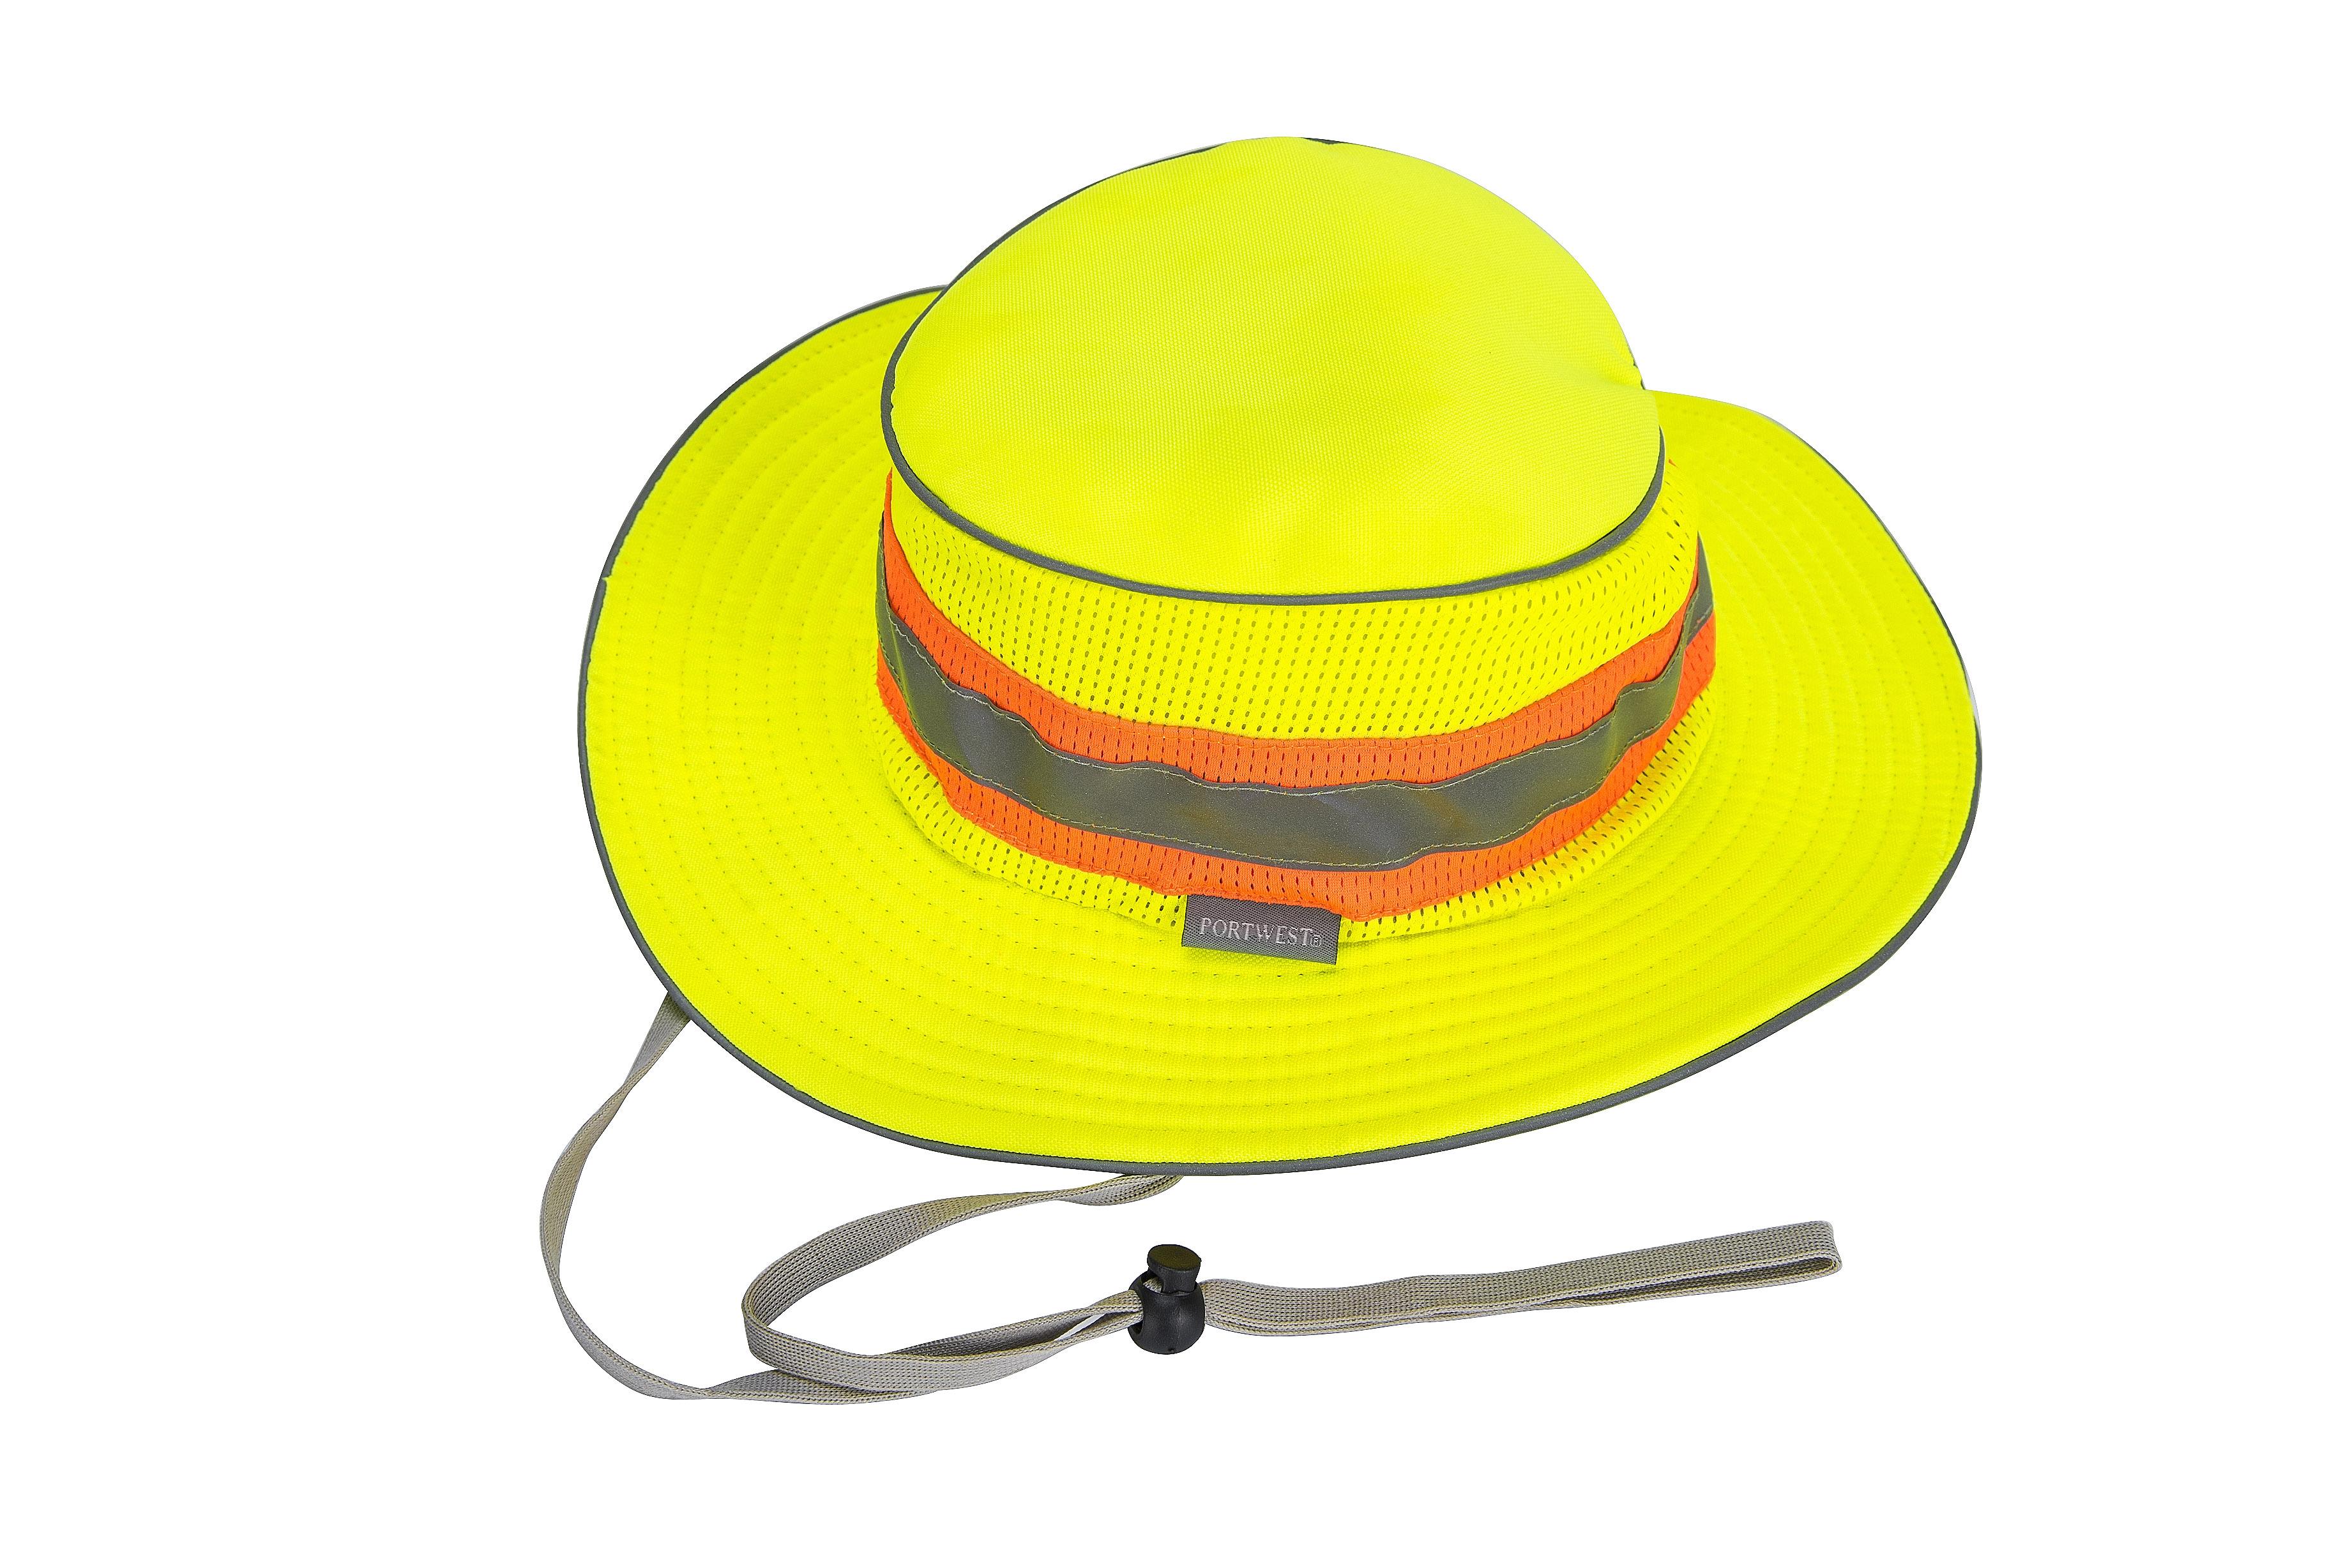 e80668b6cf19f9 High Visibility Ranger Hat - Portwest HA15 — iWantWorkwear